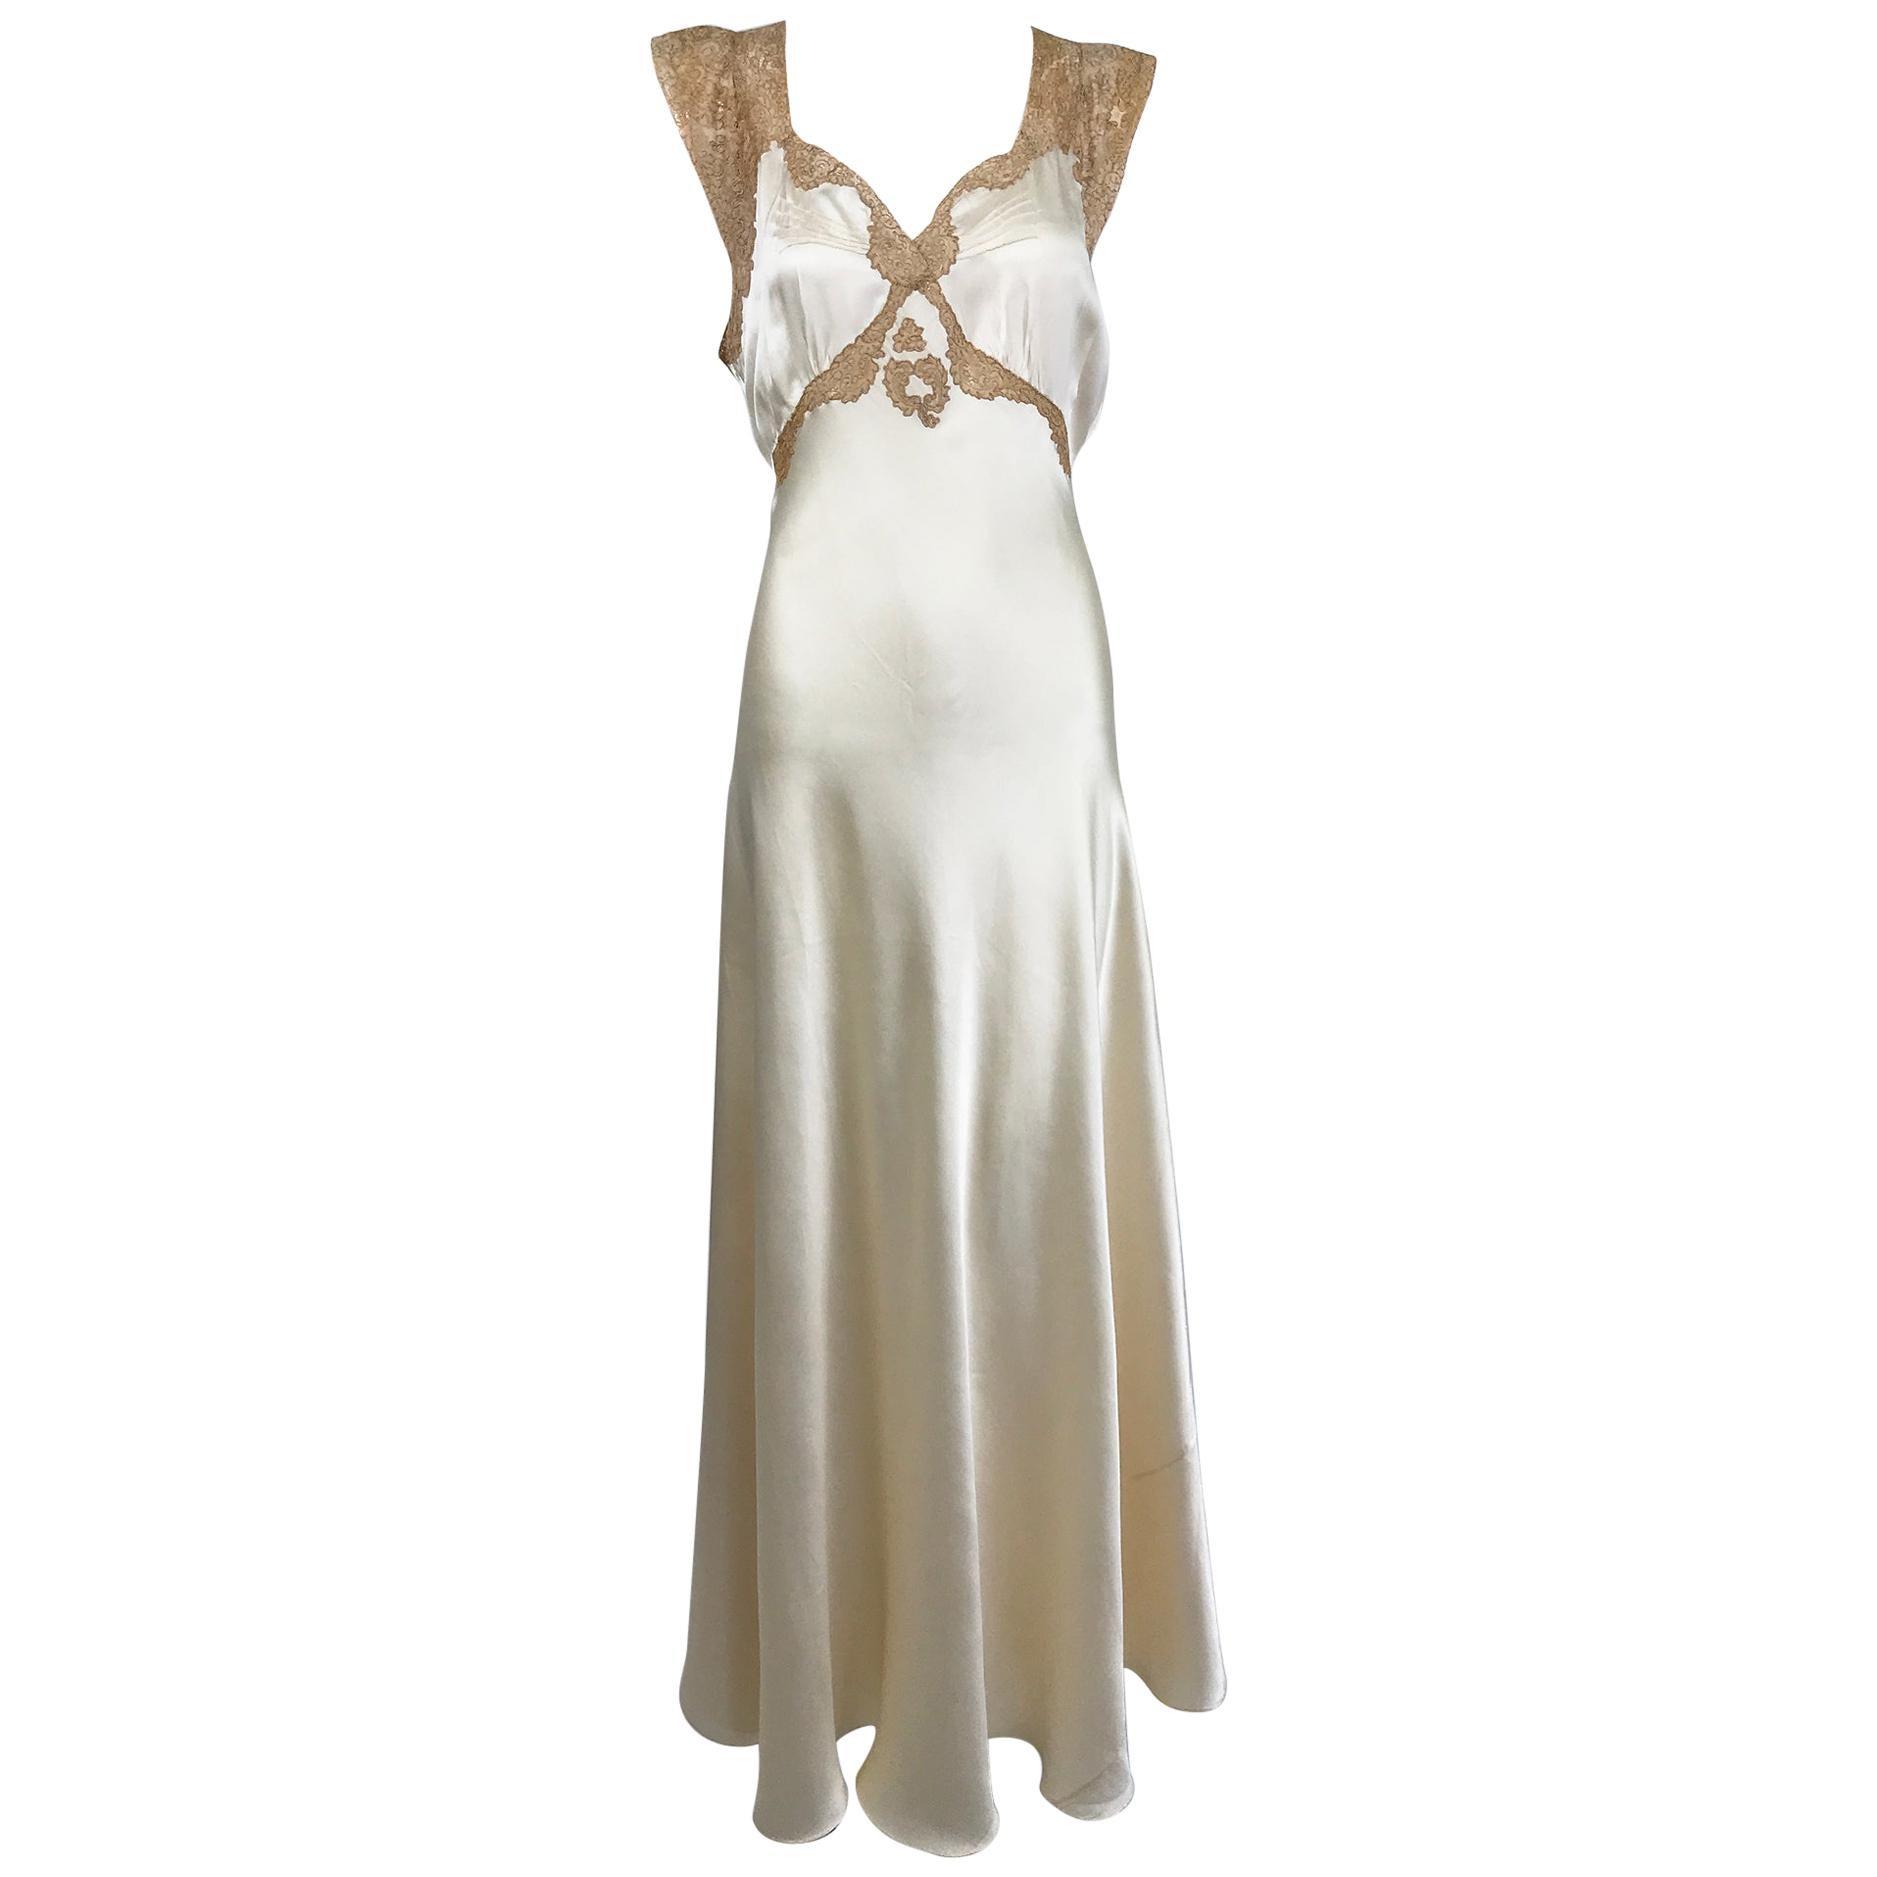 1930s Cream Silk Charmeuse Bias Cut Couture Gown With Ecru Lace Trim